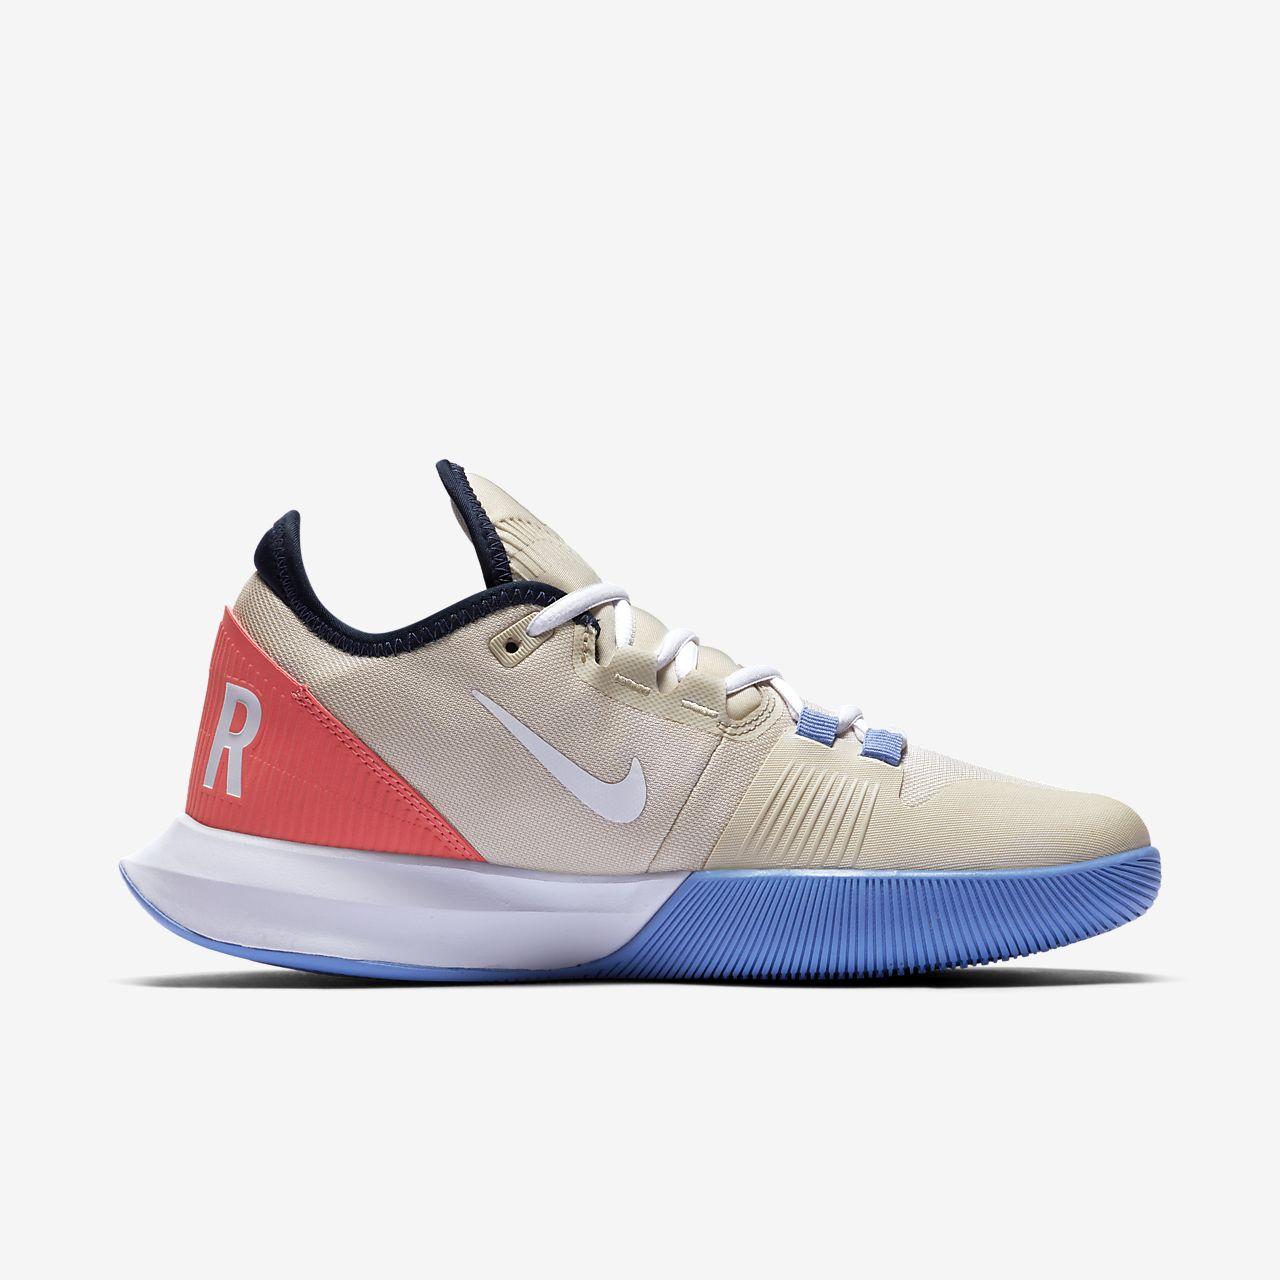 NikeCourt Air Max Wildcard Tennisschoen voor dames. Nike NL